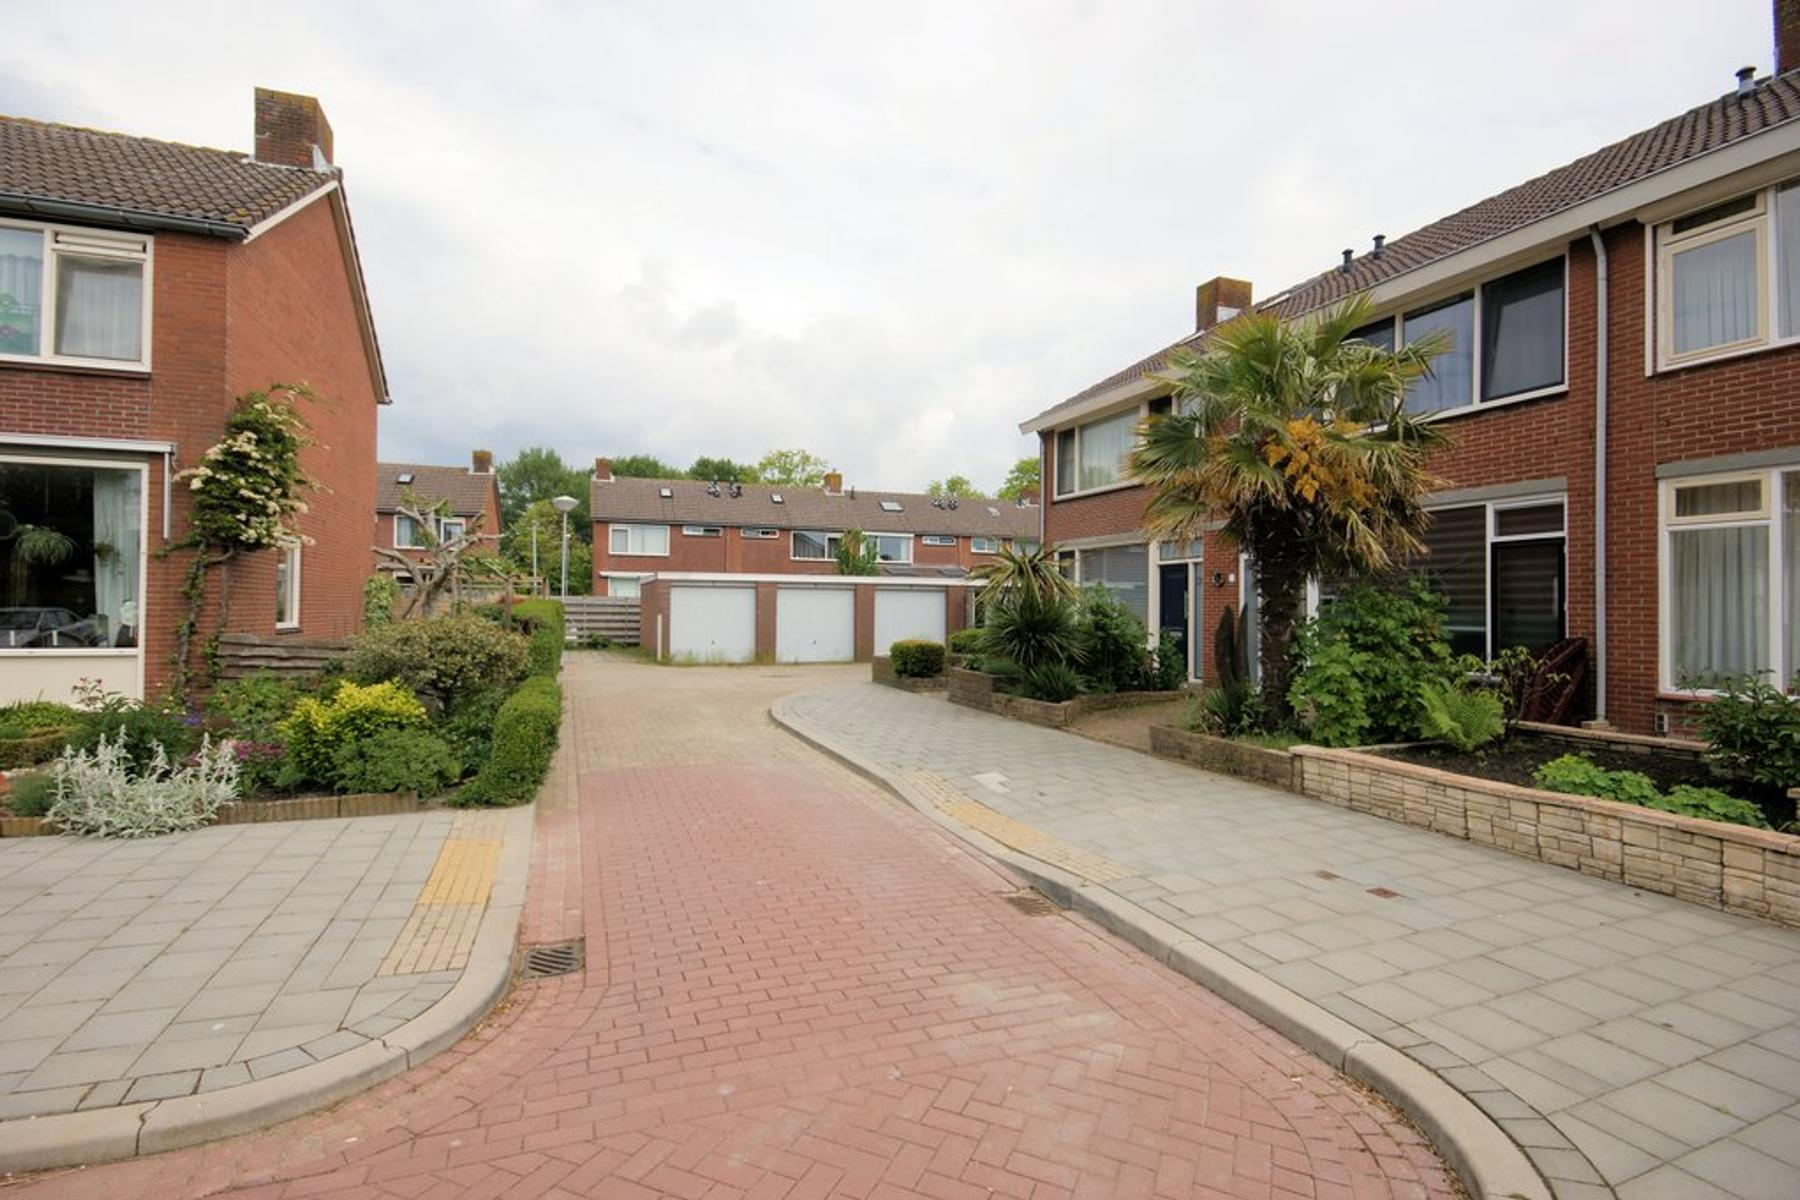 Roerstraat 28 - G10 in Oost-Souburg 4388 RW